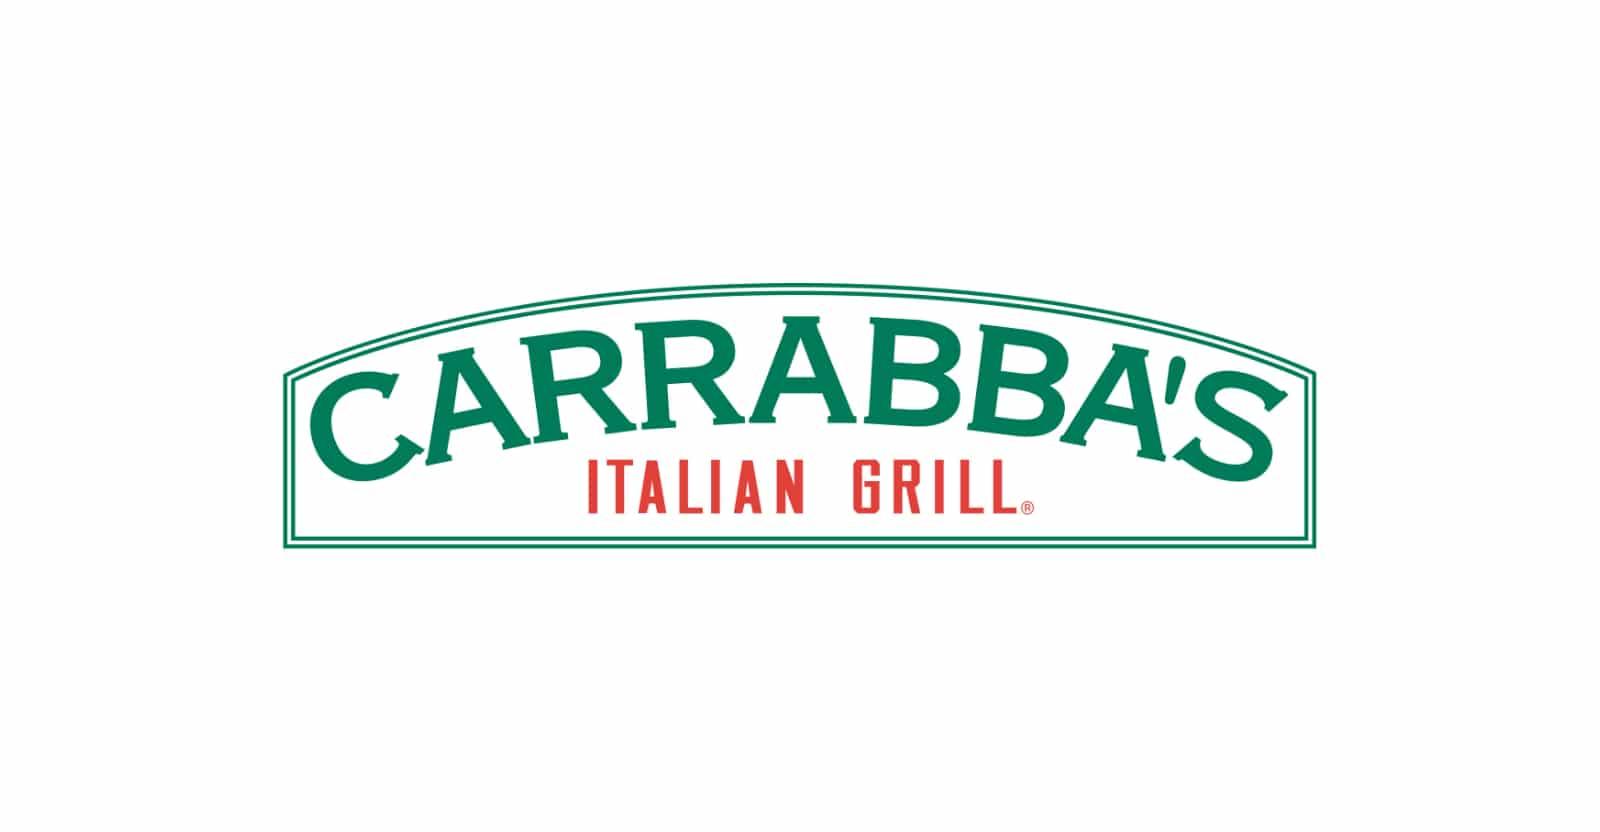 Carrabba's Gluten-Free Menu